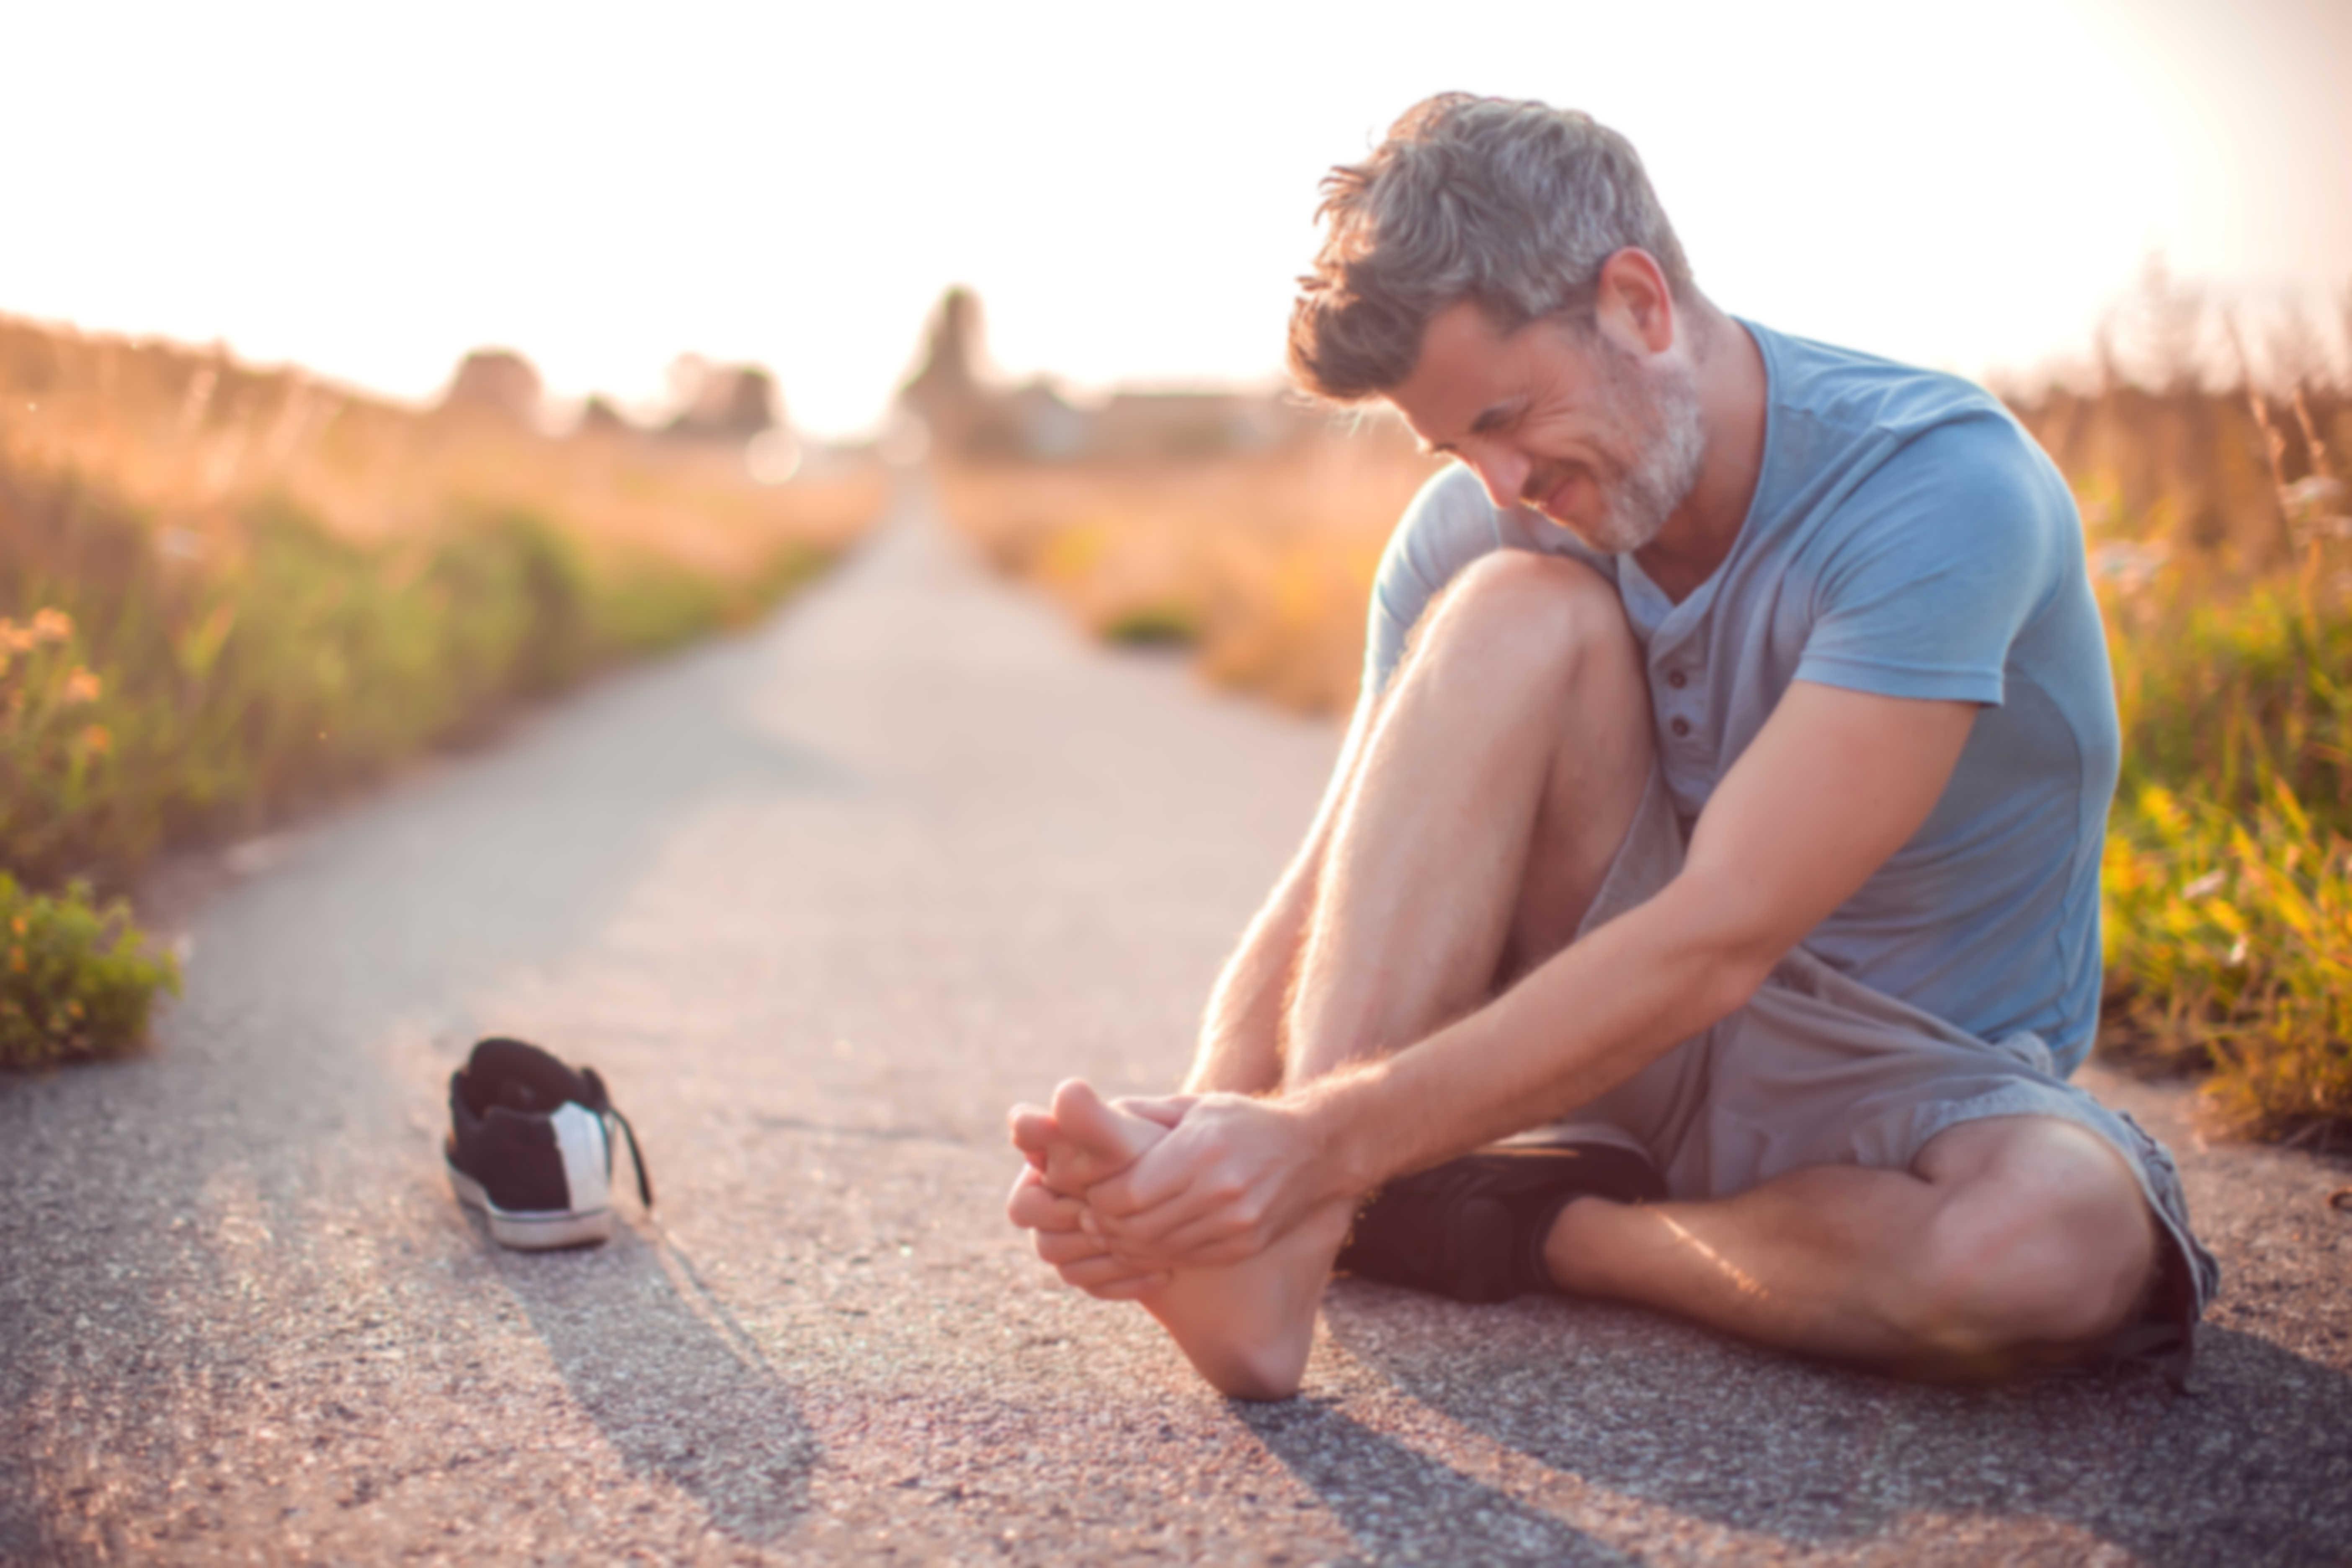 Runners leg cramp